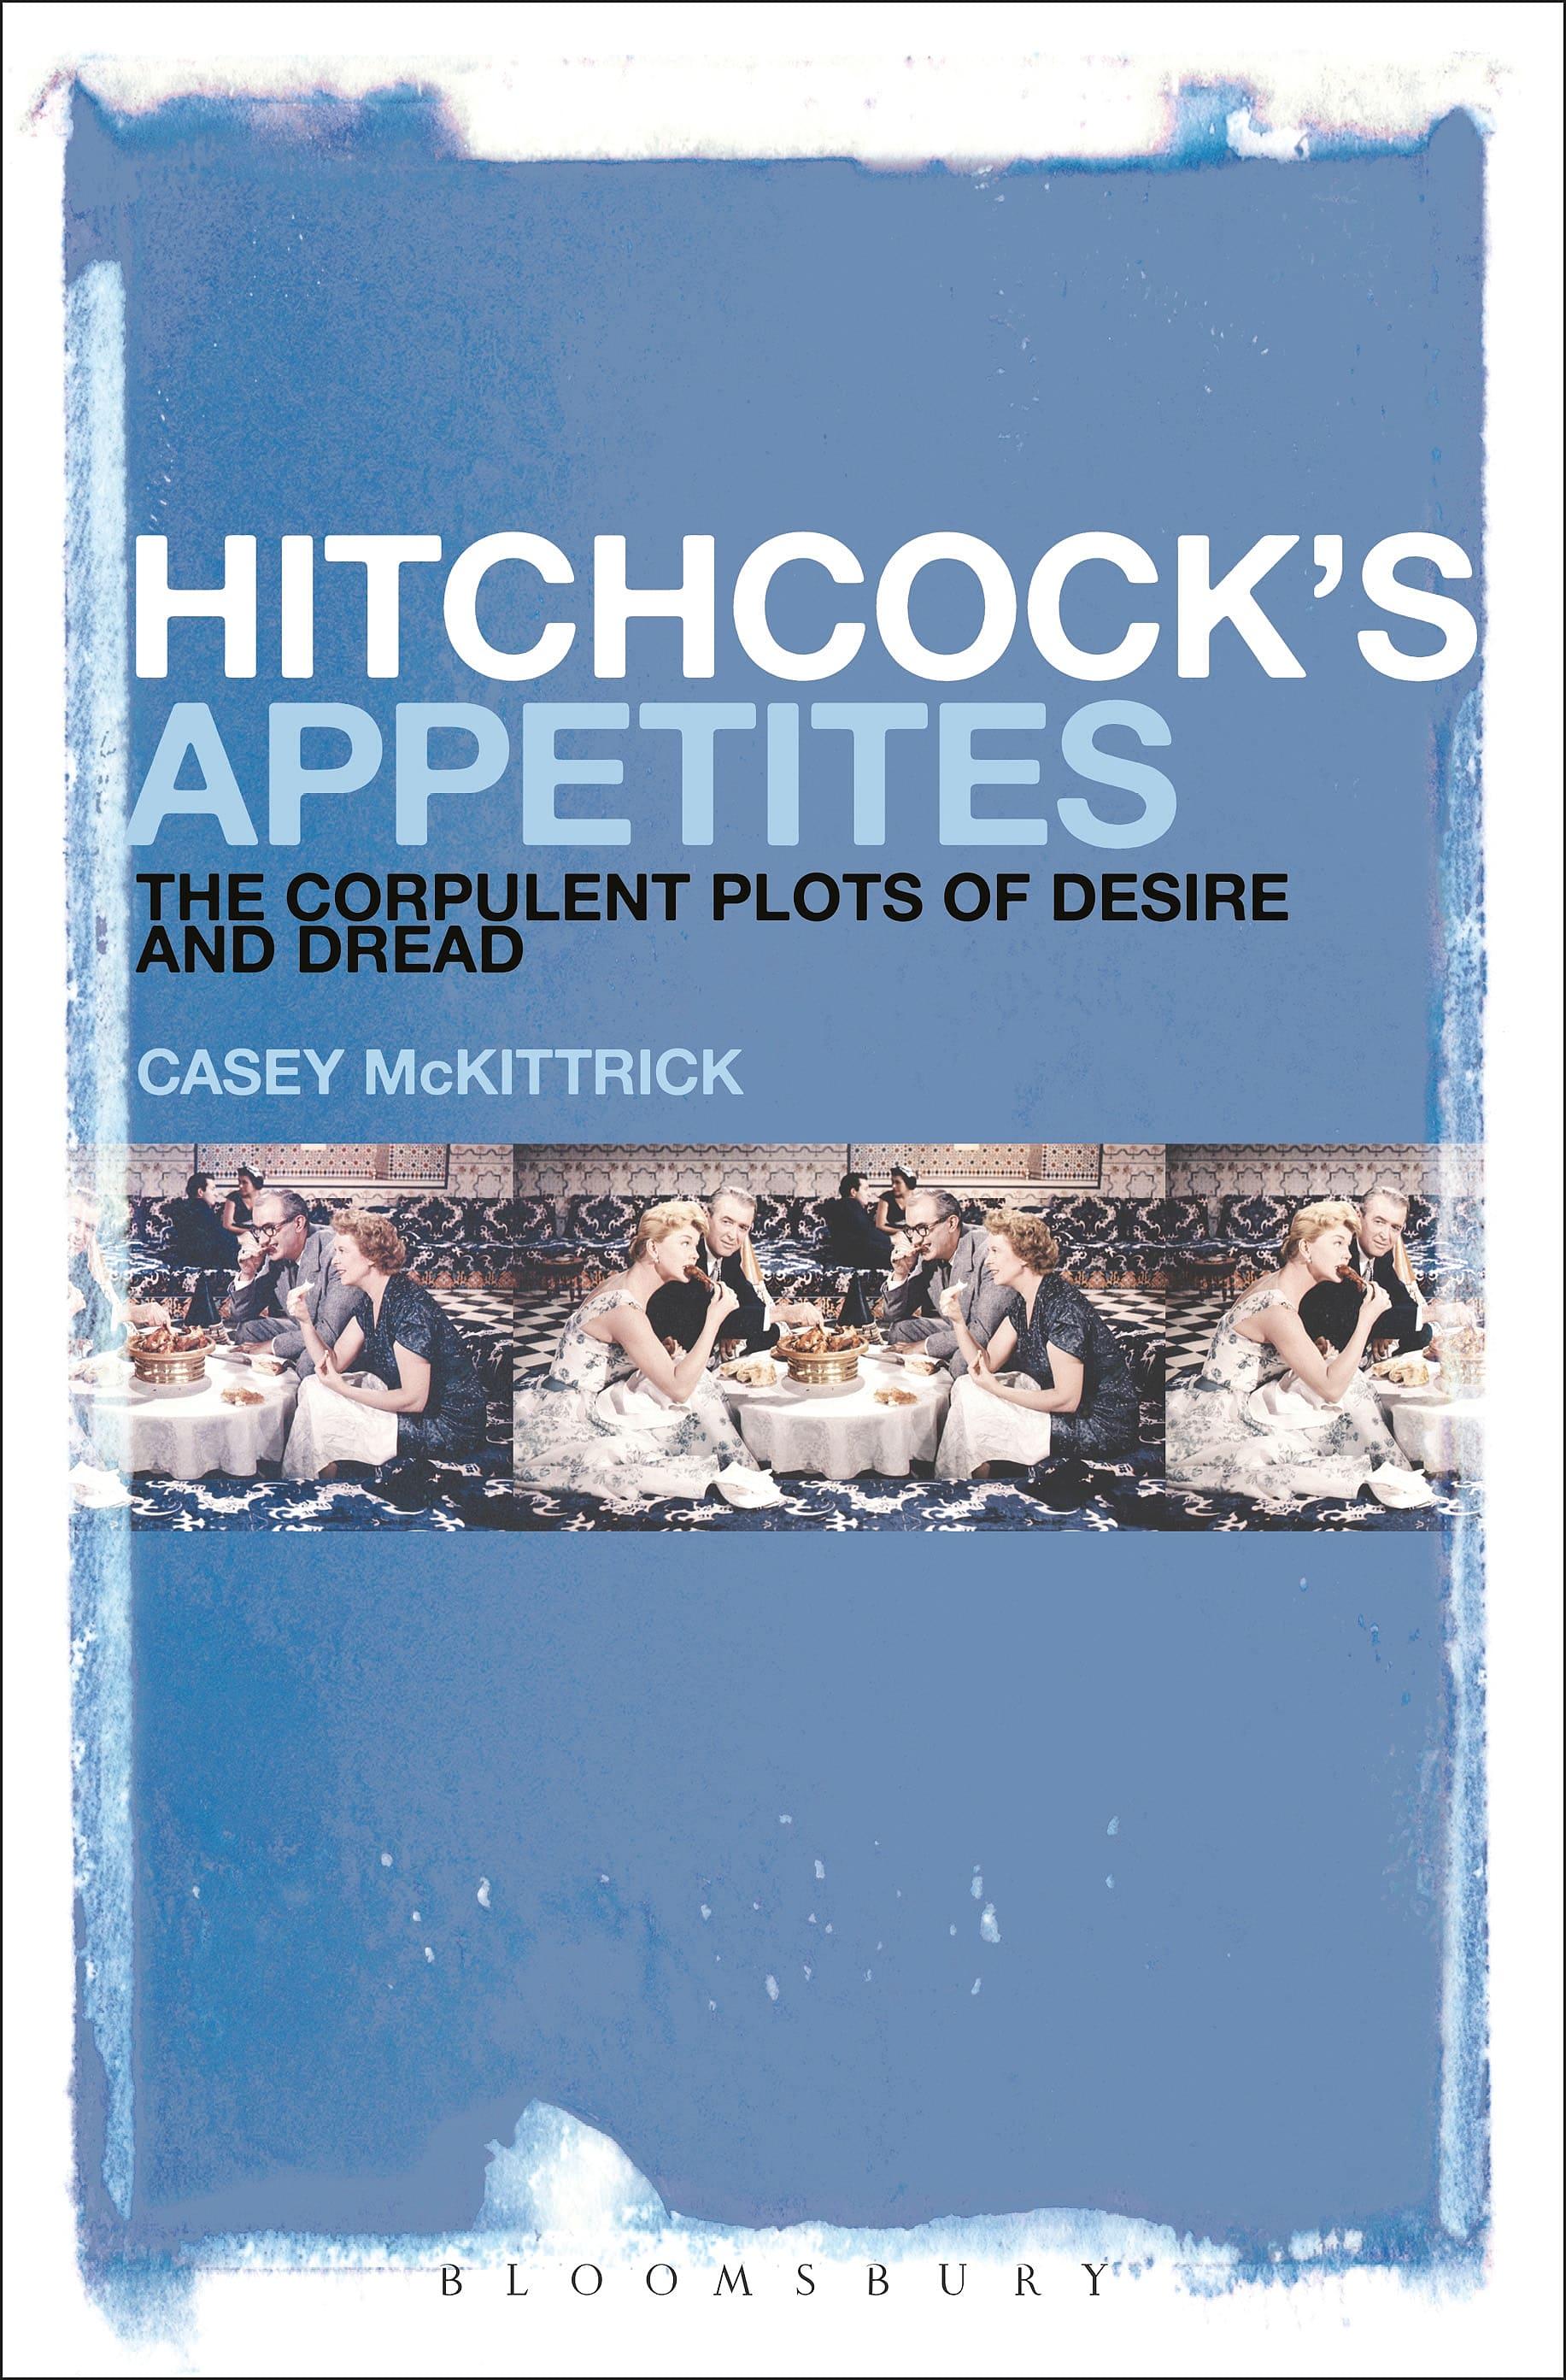 Hitchcock's Appetites